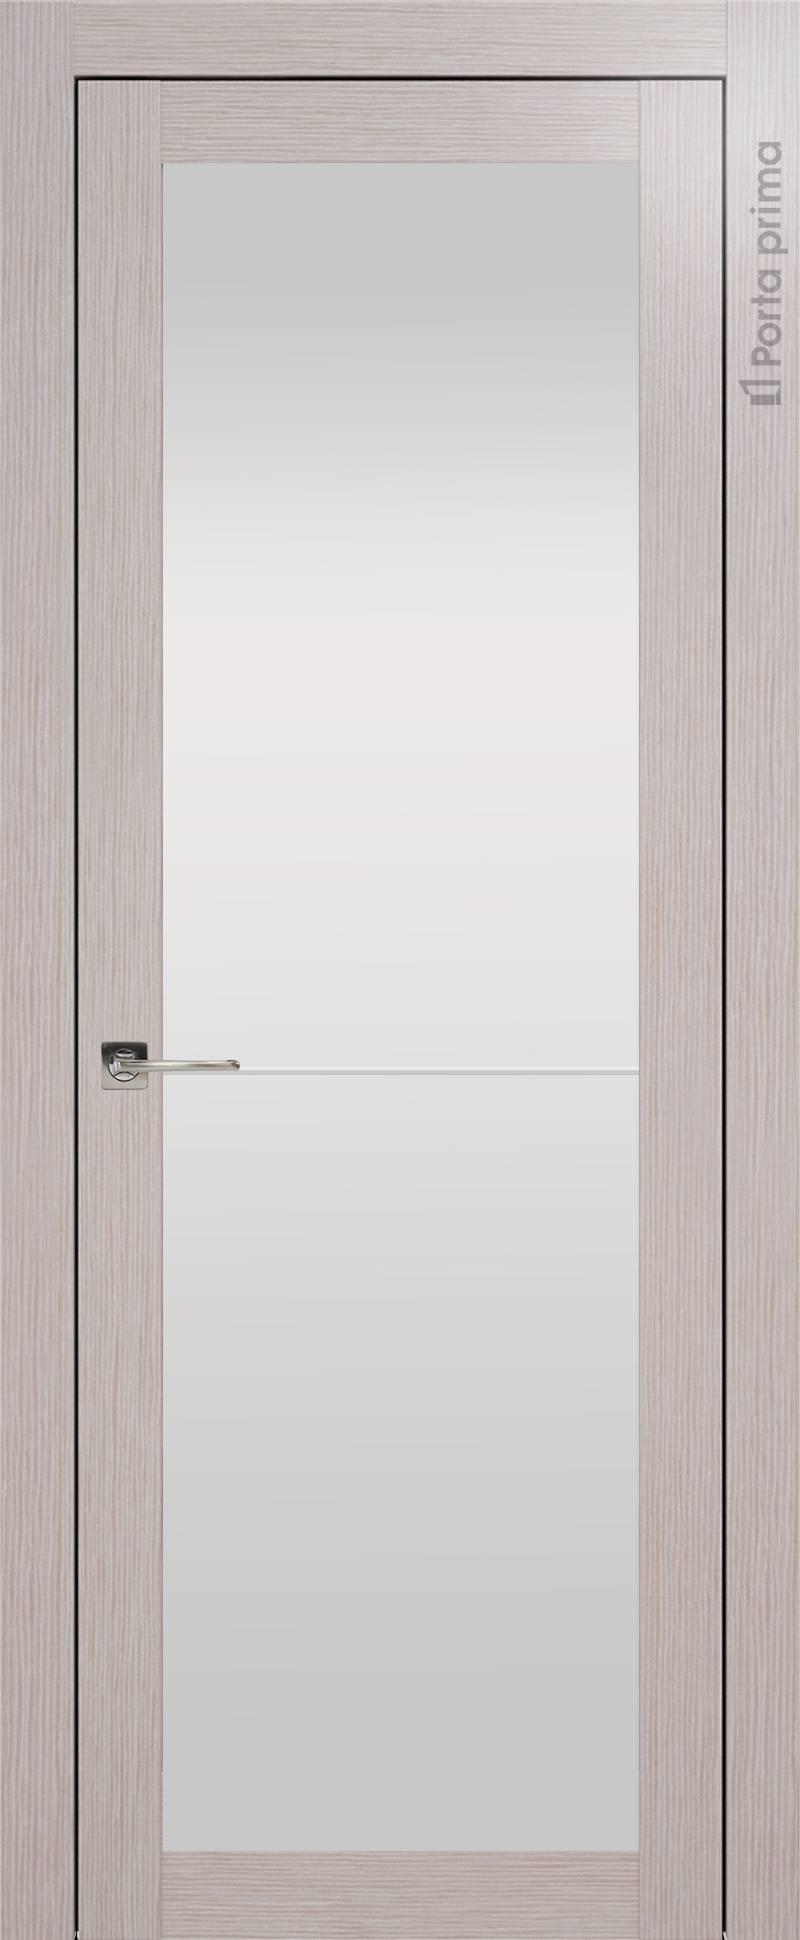 Tivoli З-2 цвет - Дымчатый дуб Со стеклом (ДО)